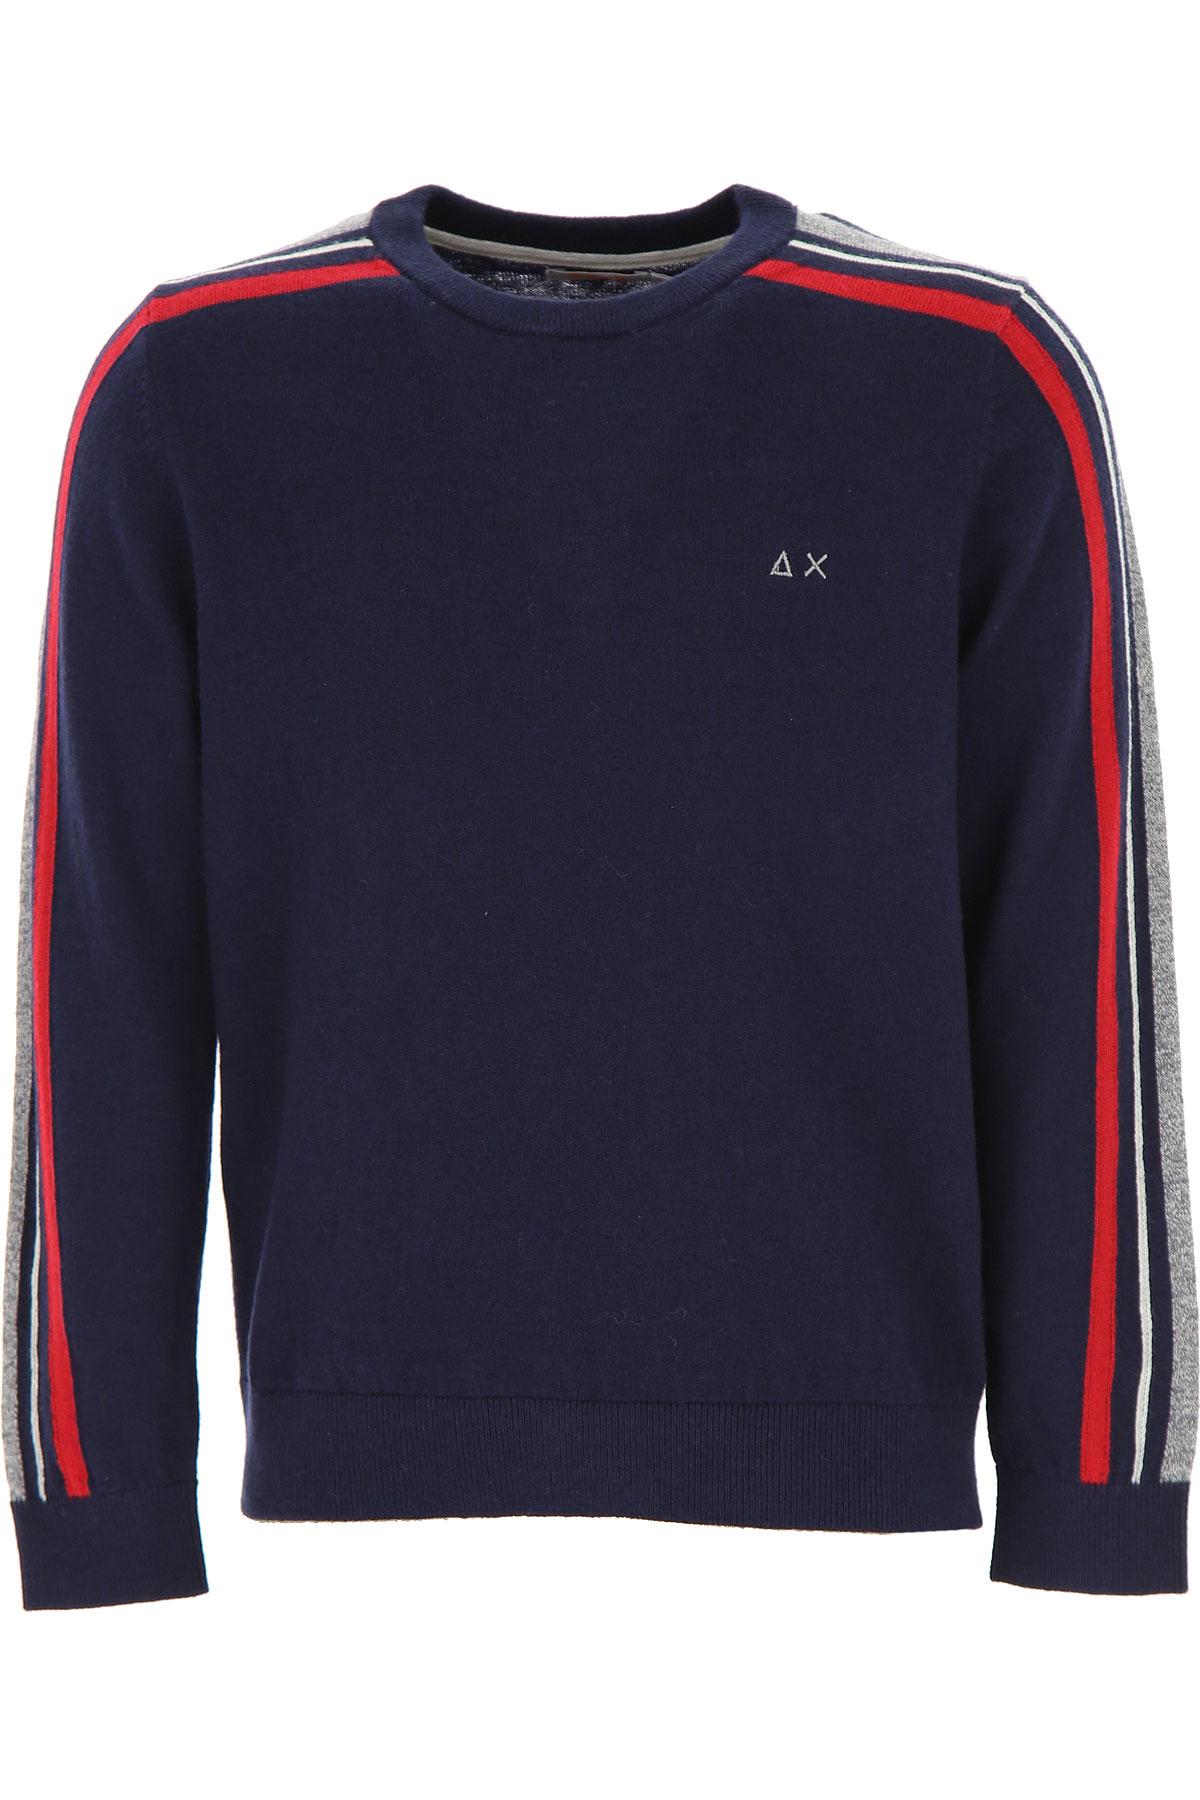 Sun68 Kids Sweaters for Boys On Sale, Blue, Wool, 2019, 10Y 12Y 6Y 8Y